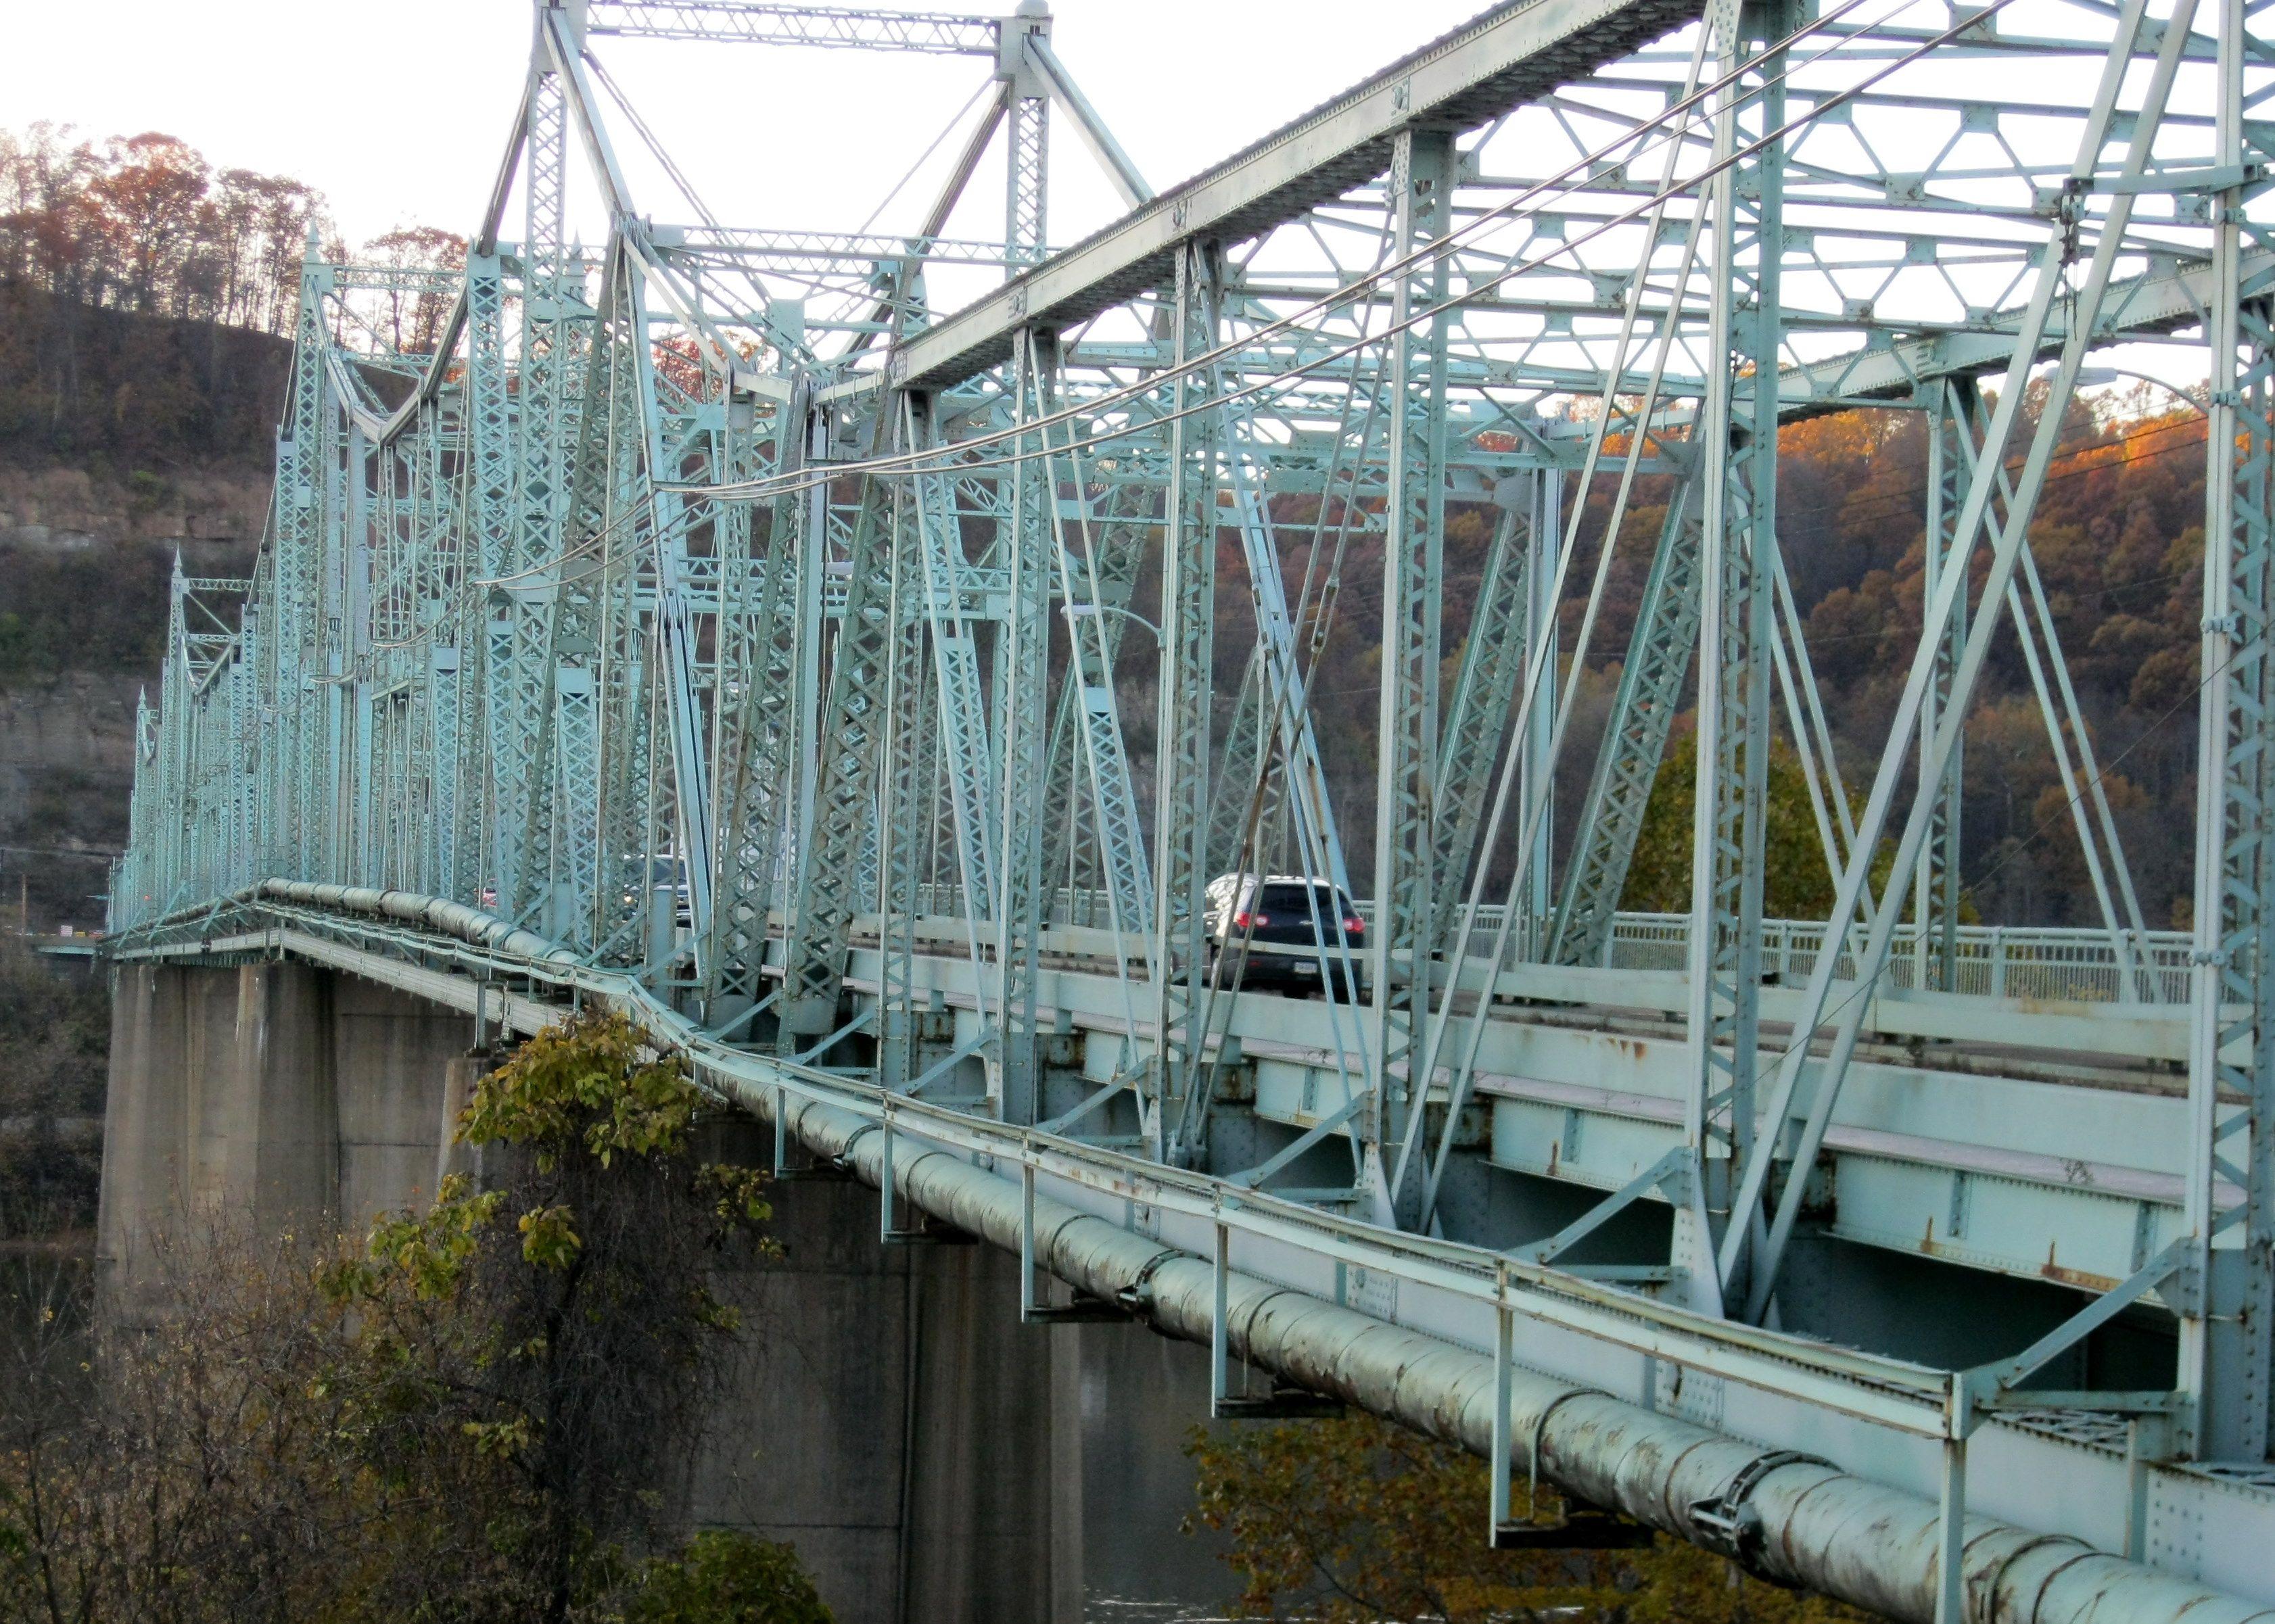 aqua bridge beaver county pa just because i like it aqua bridge beaver county pa